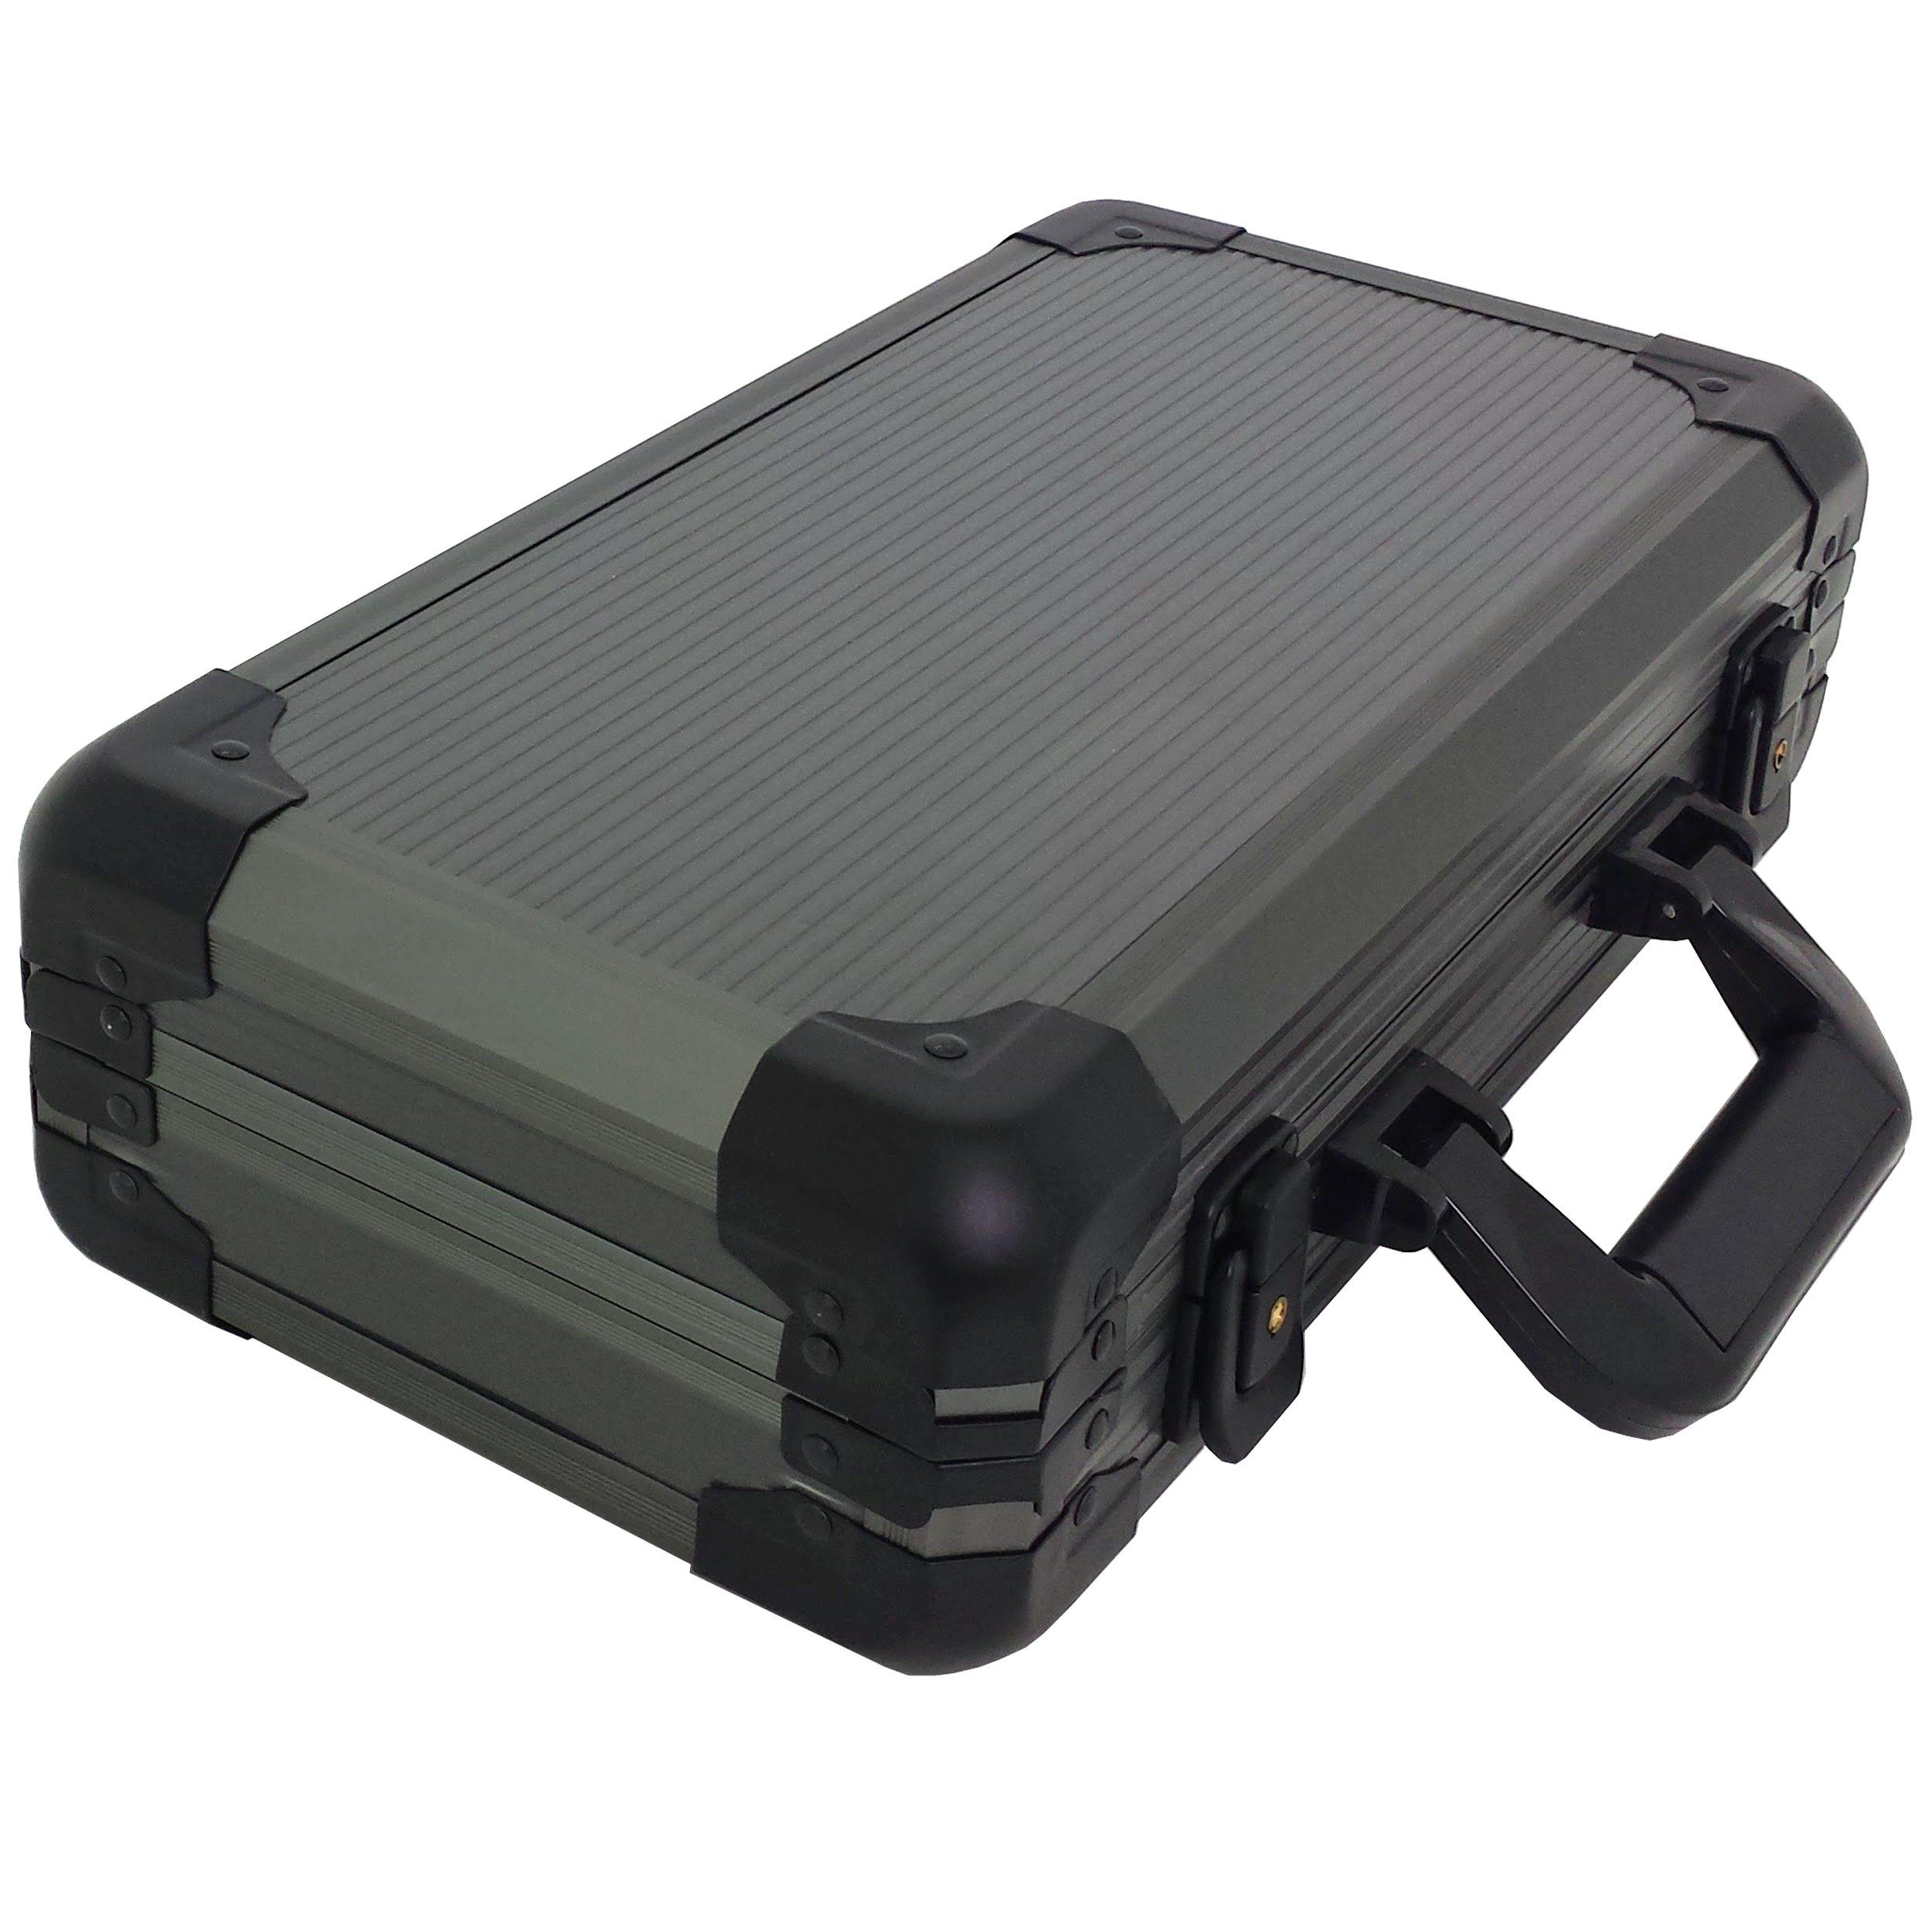 Watch Storage Case Aluminum Metal Briefcase for 12 Large Watches (Gunmetal Grey)